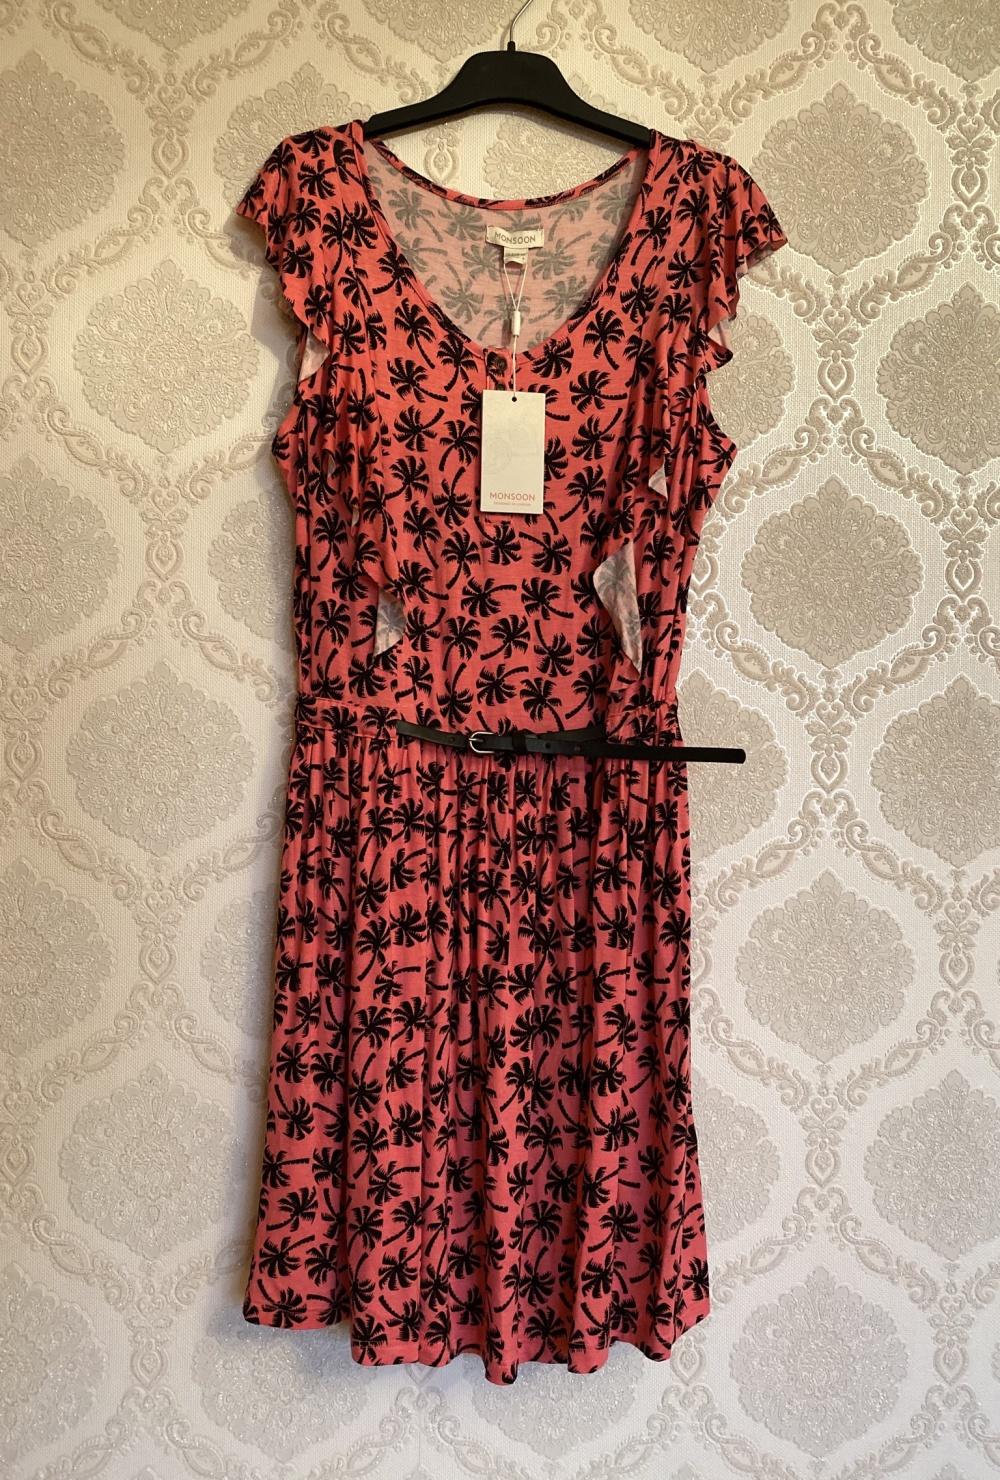 Платье Monsoon размер 46-48